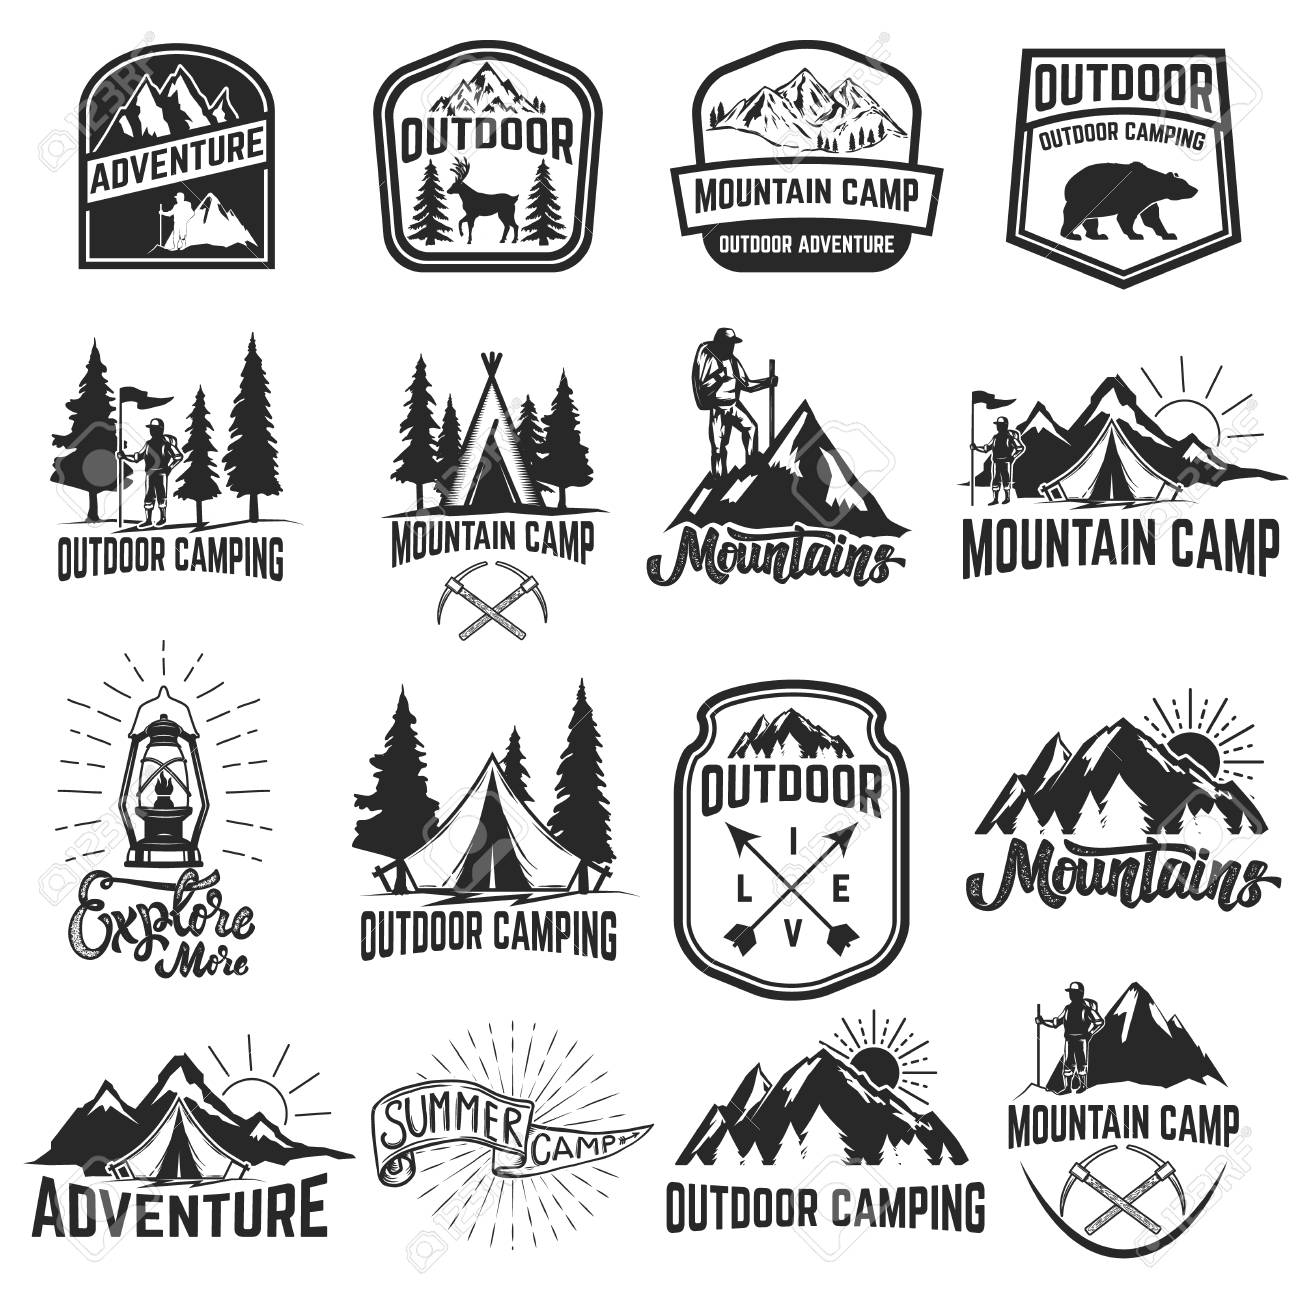 Set of camping emblems isolated on white background. Hiking, tourism, outdoor adventure. Design elements for logo, label, emblem, sign. Vector illustration - 85563923